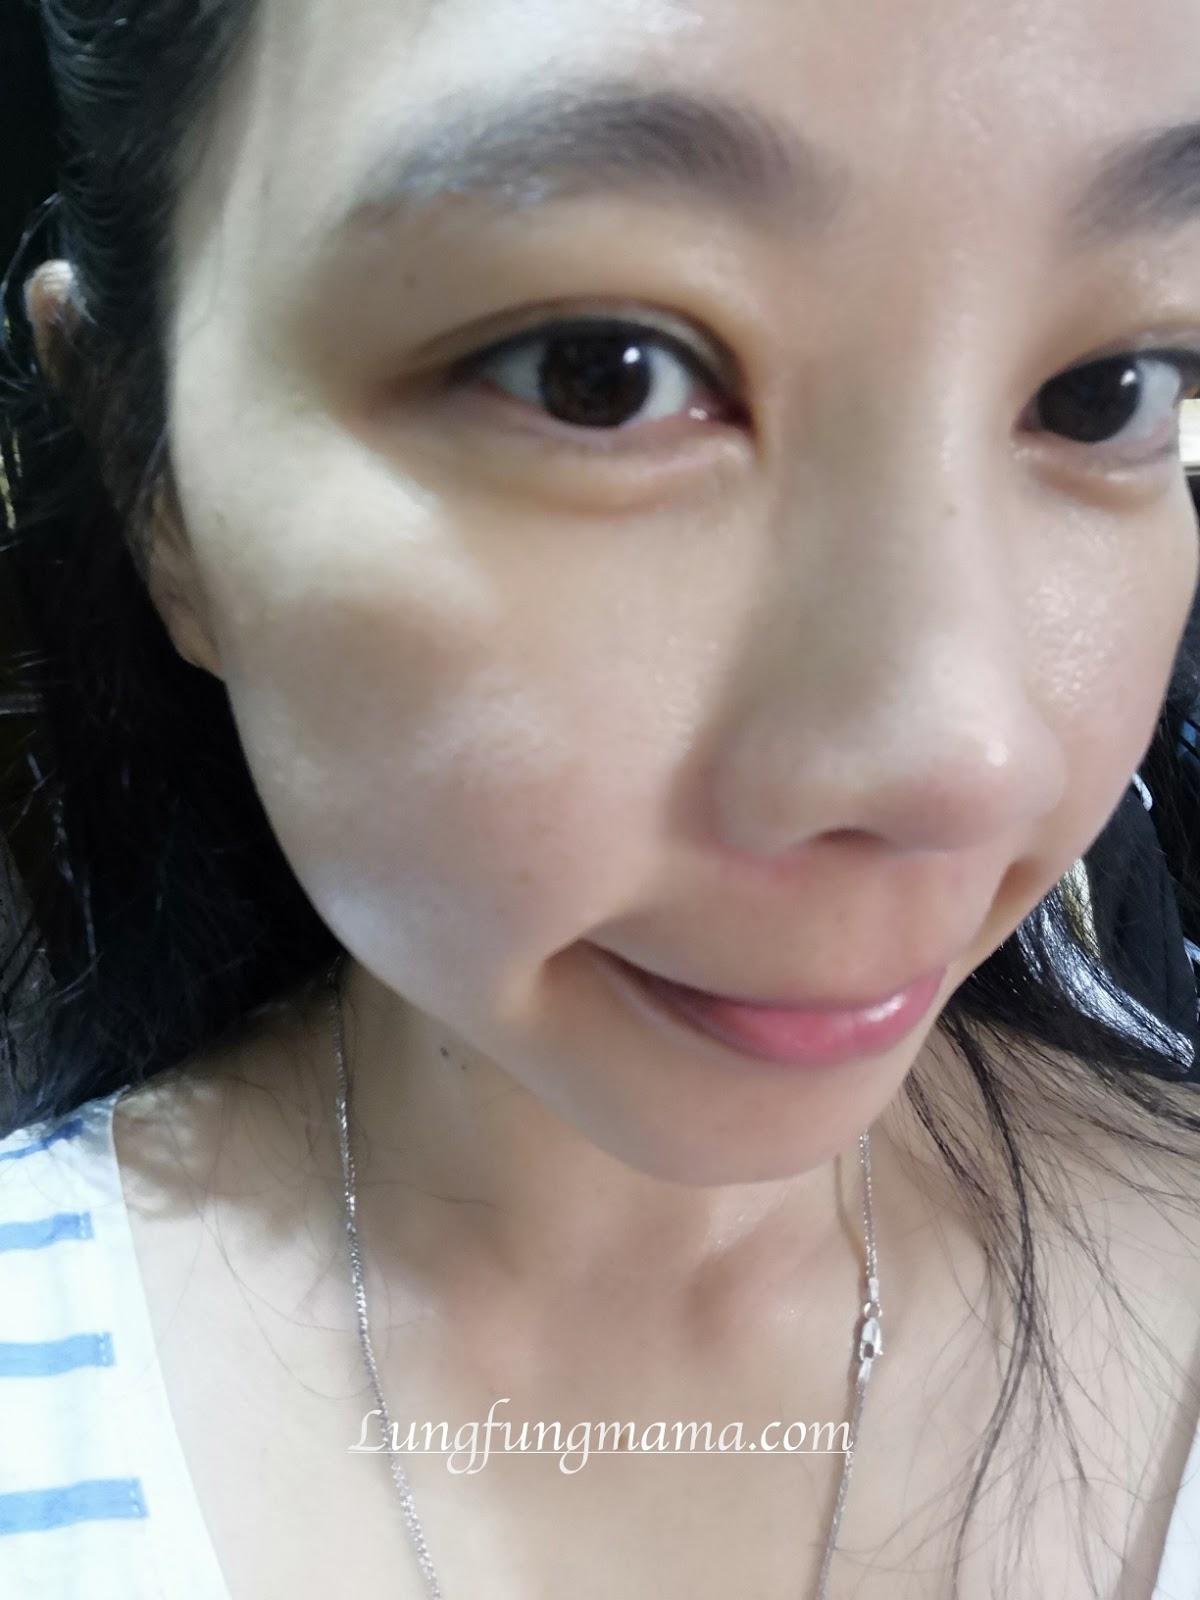 bbs-modelling-trixie-porn-pics-asian-shemale-solo-vids